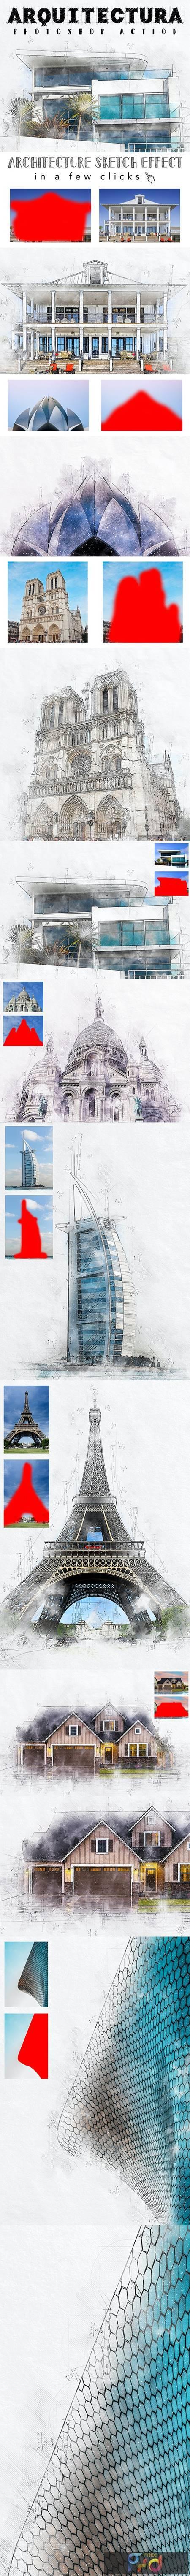 Arquitectura - Architecture Sketch Photoshop Action 26013208 1